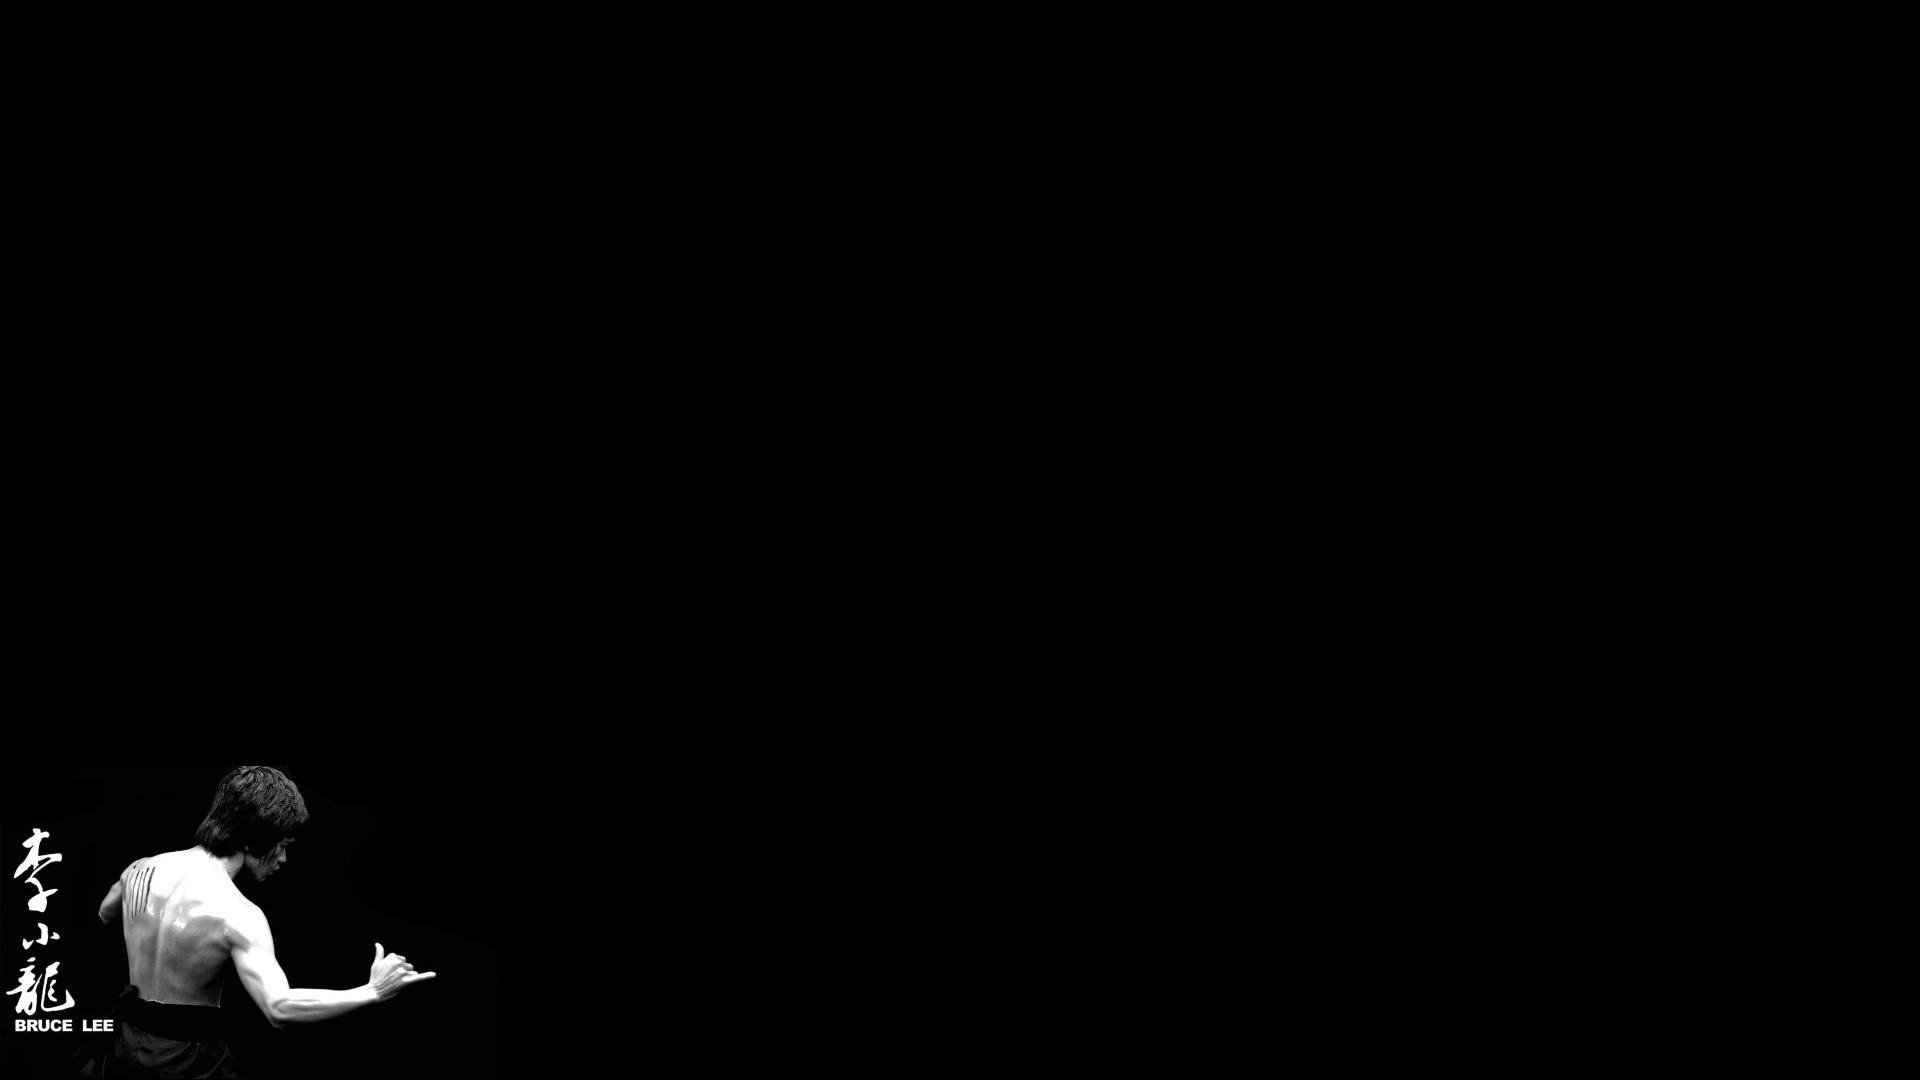 Full HD P Bruce Lee Wallpapers HD, Desktop Backgrounds